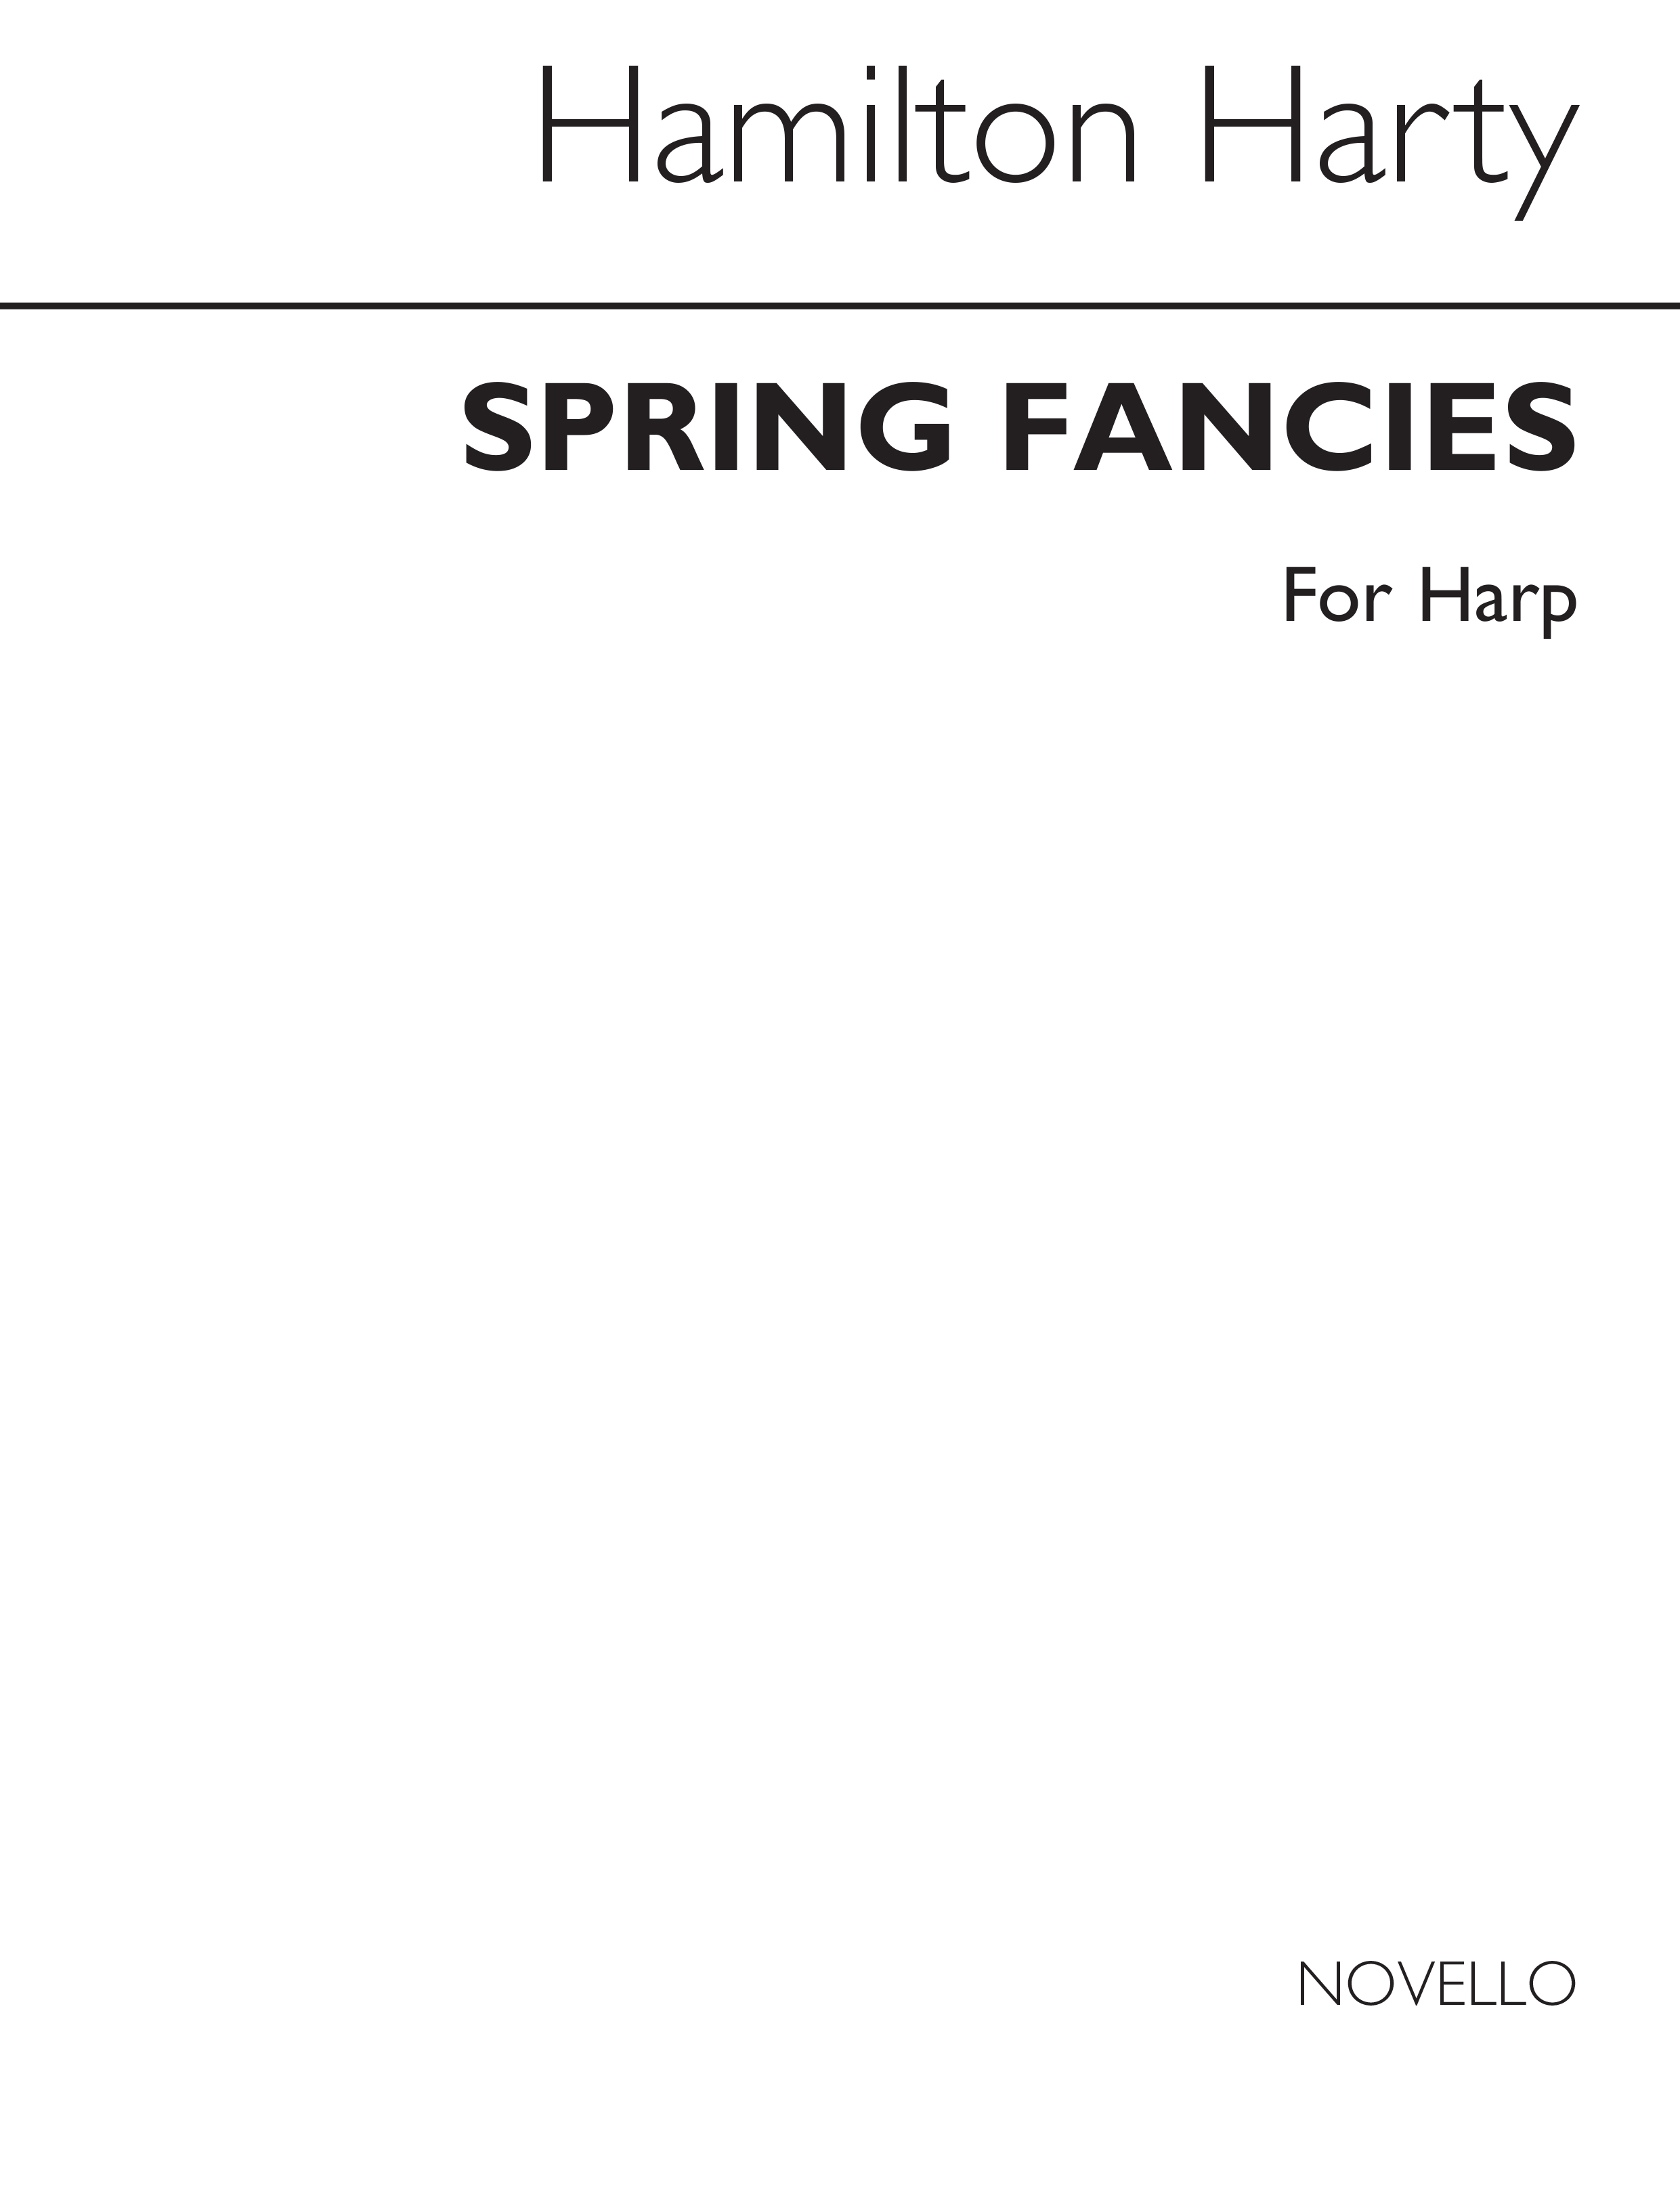 Hamilton Harty: Spring Fancies - Two Preludes for Harp: Harp: Instrumental Album